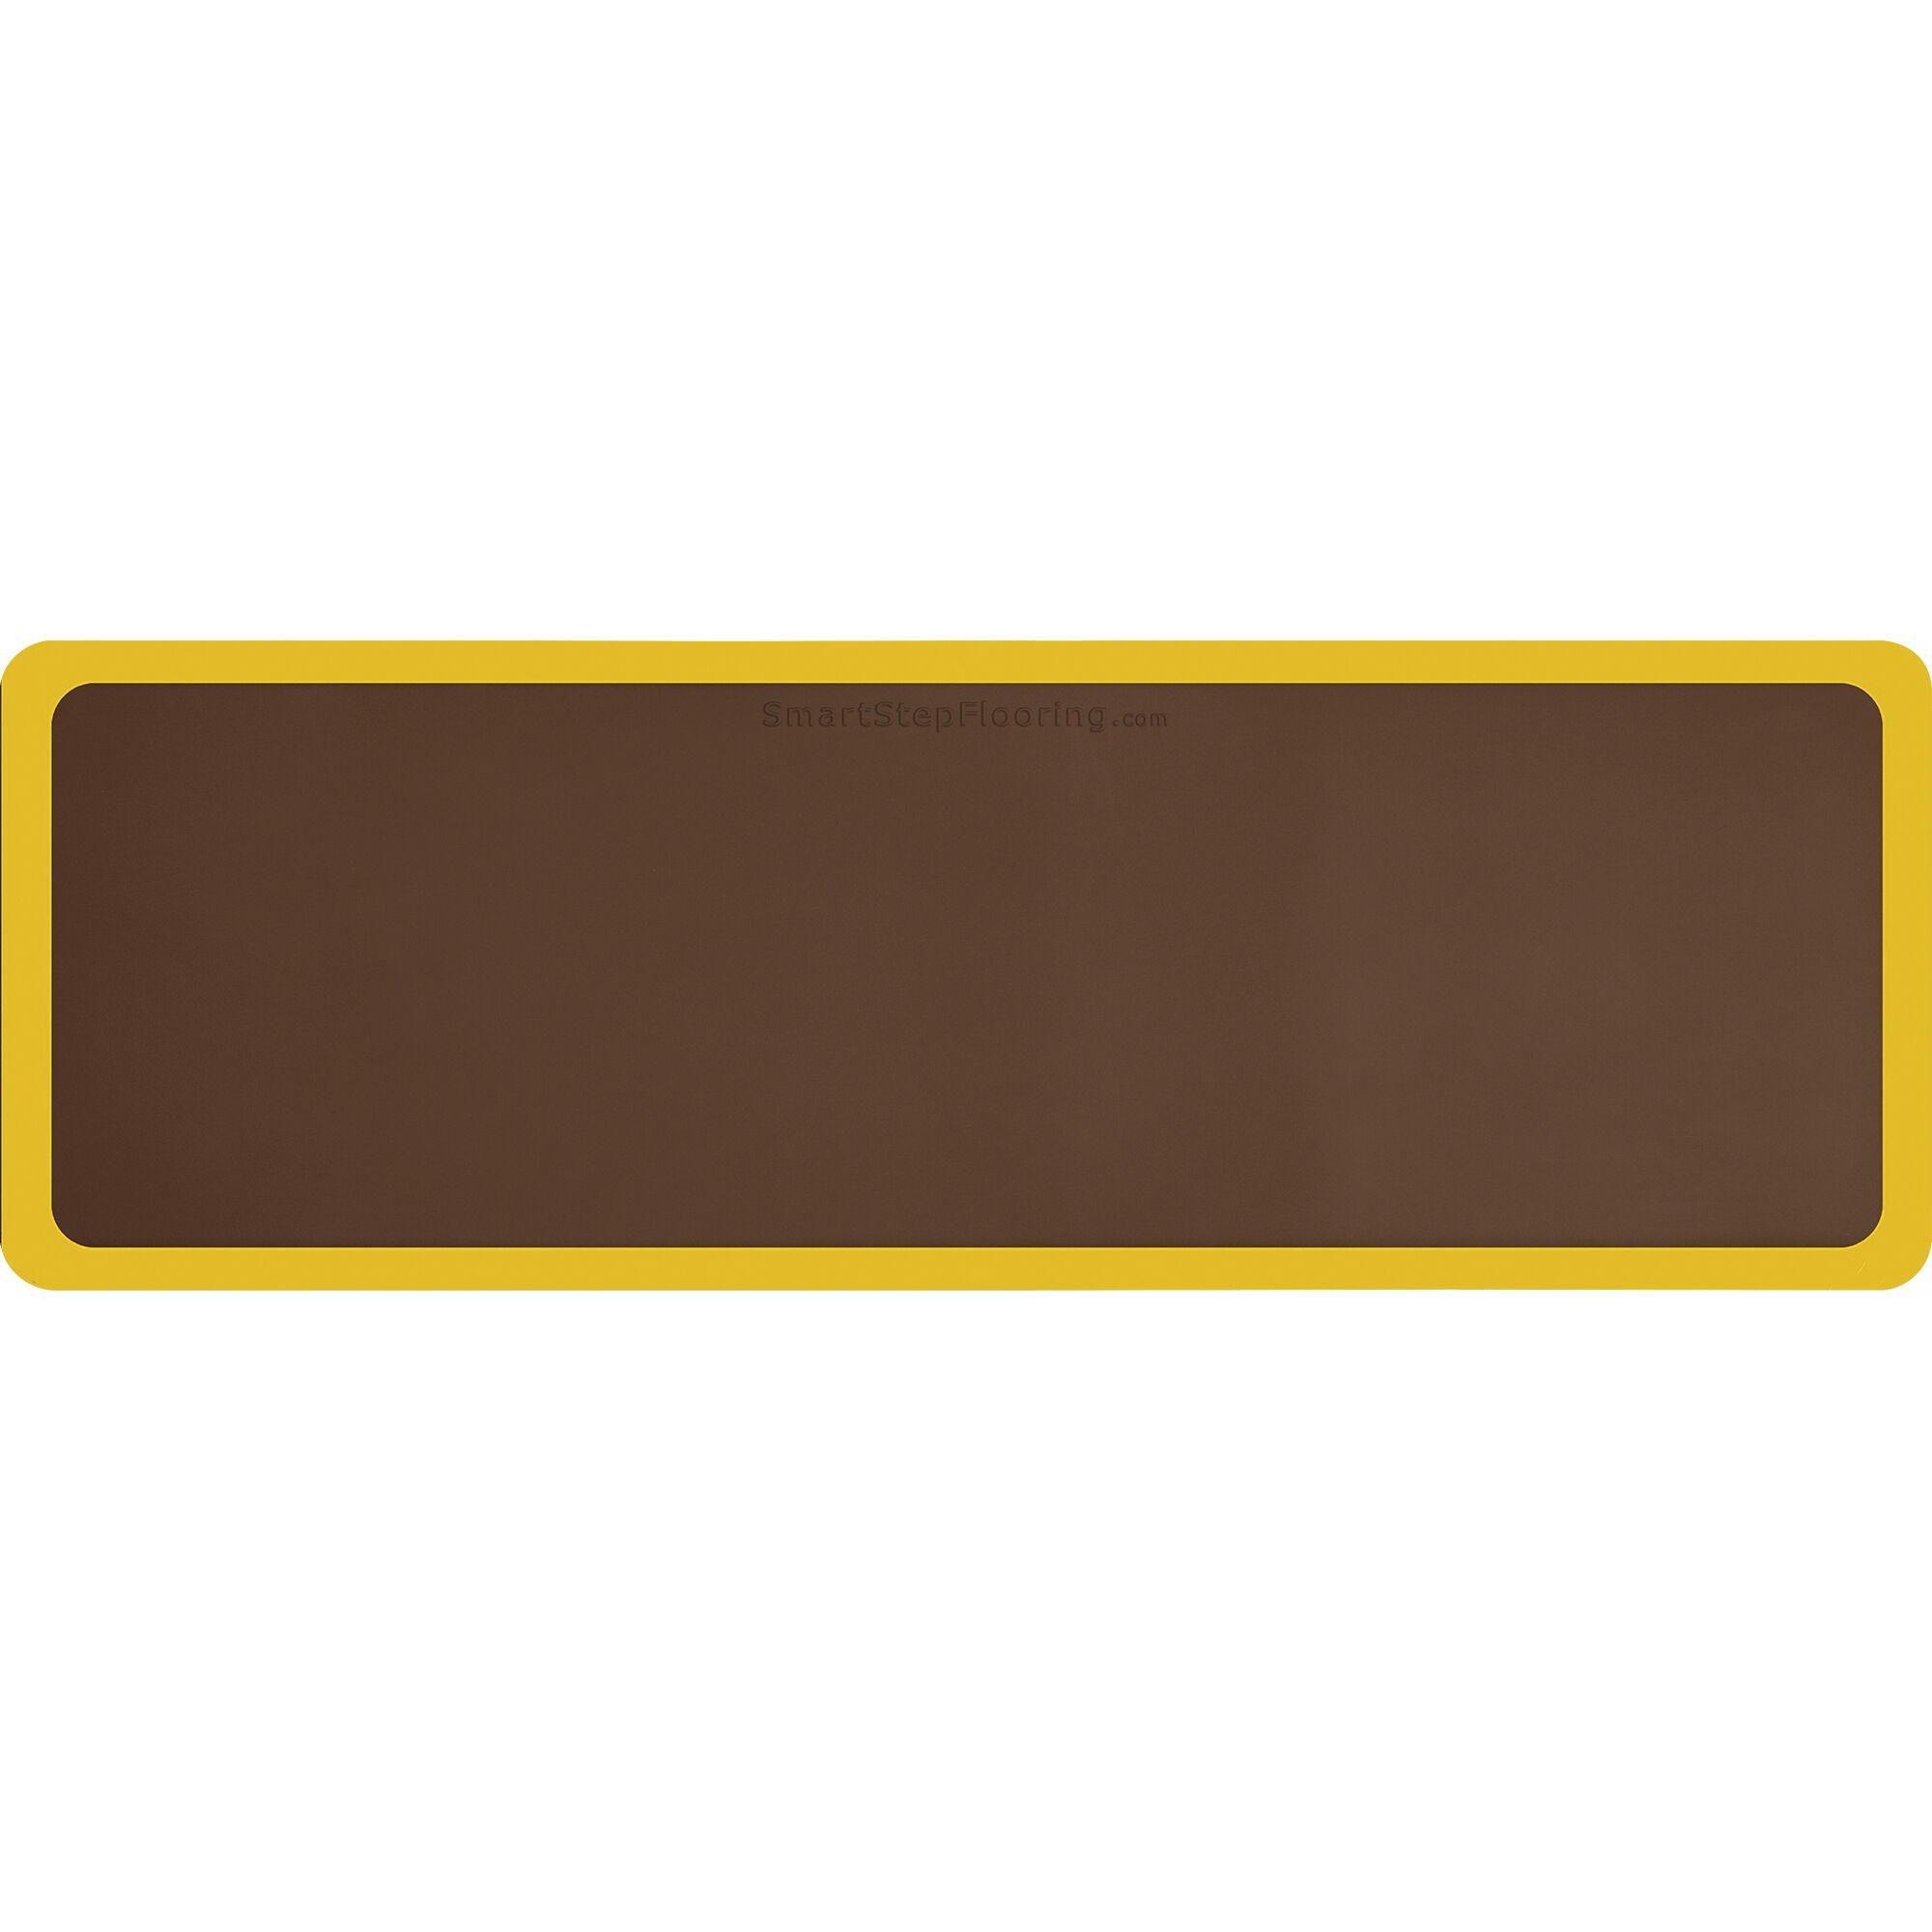 Contour Kitchen Mat Mat Size: Rectangle 6' x 2', Color: Brown/Yellow